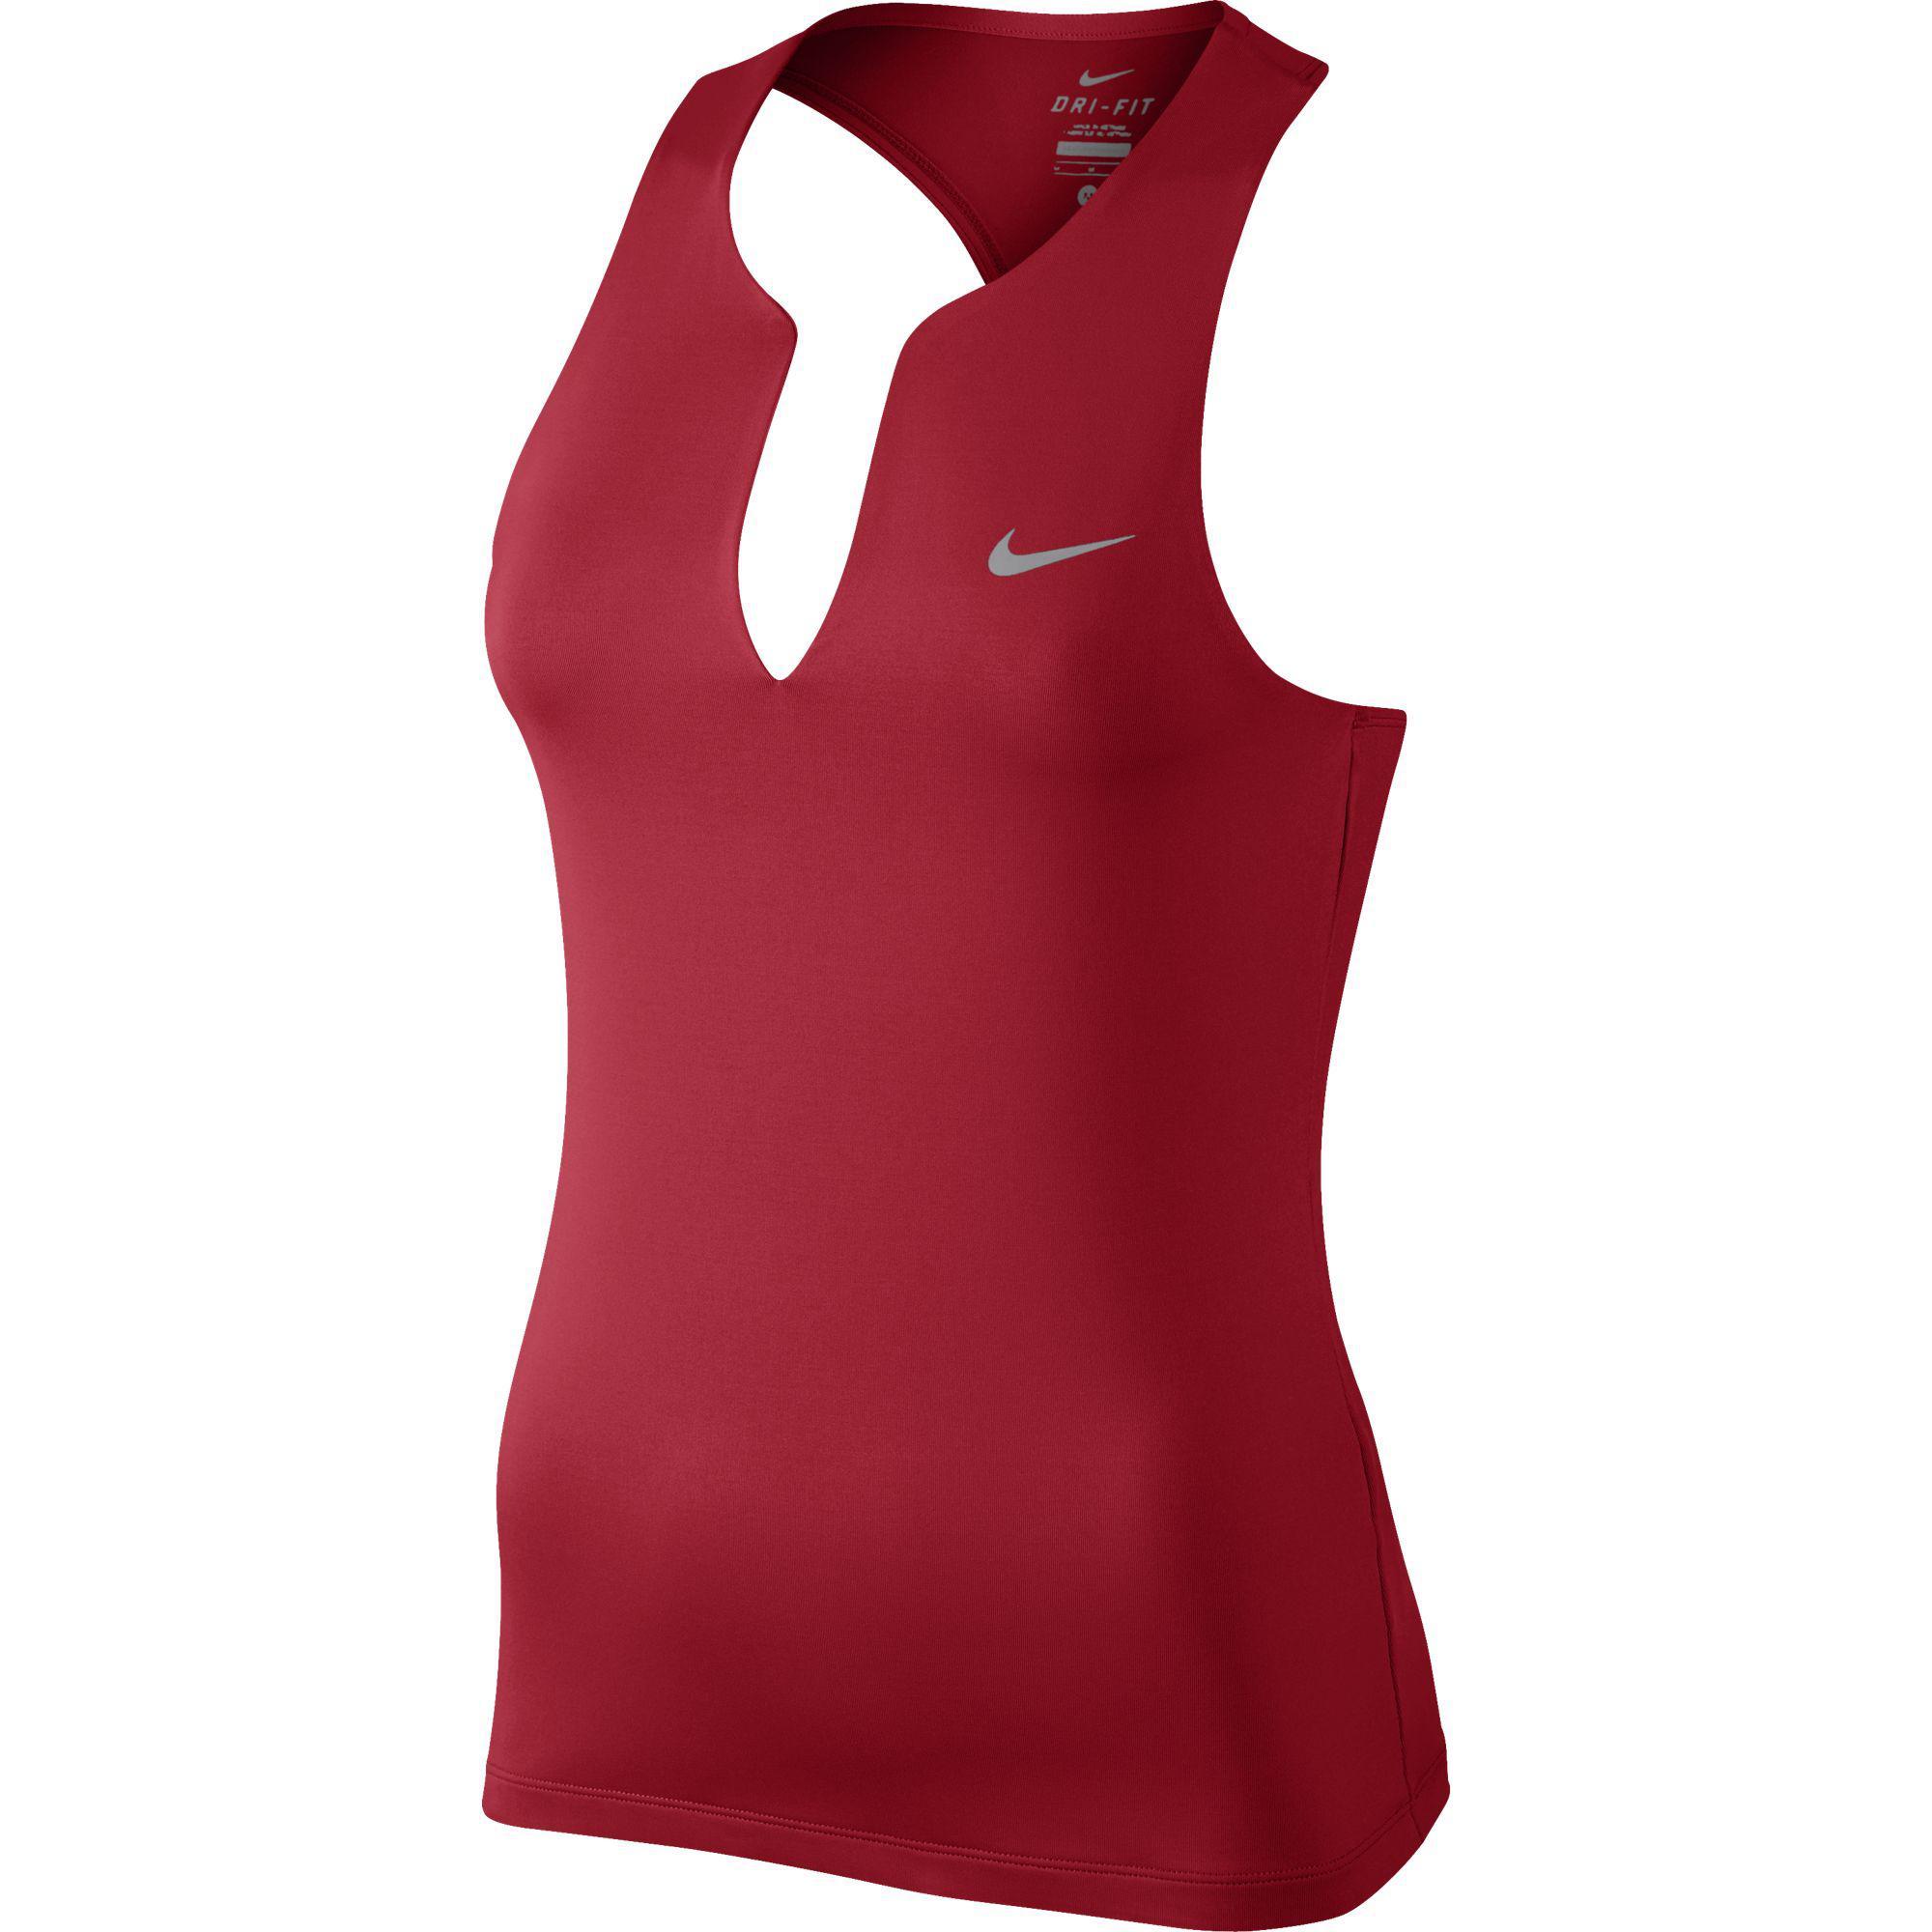 Nike Womens Pure Tennis Tank Top - University Red - Tennisnuts.com d5646c636